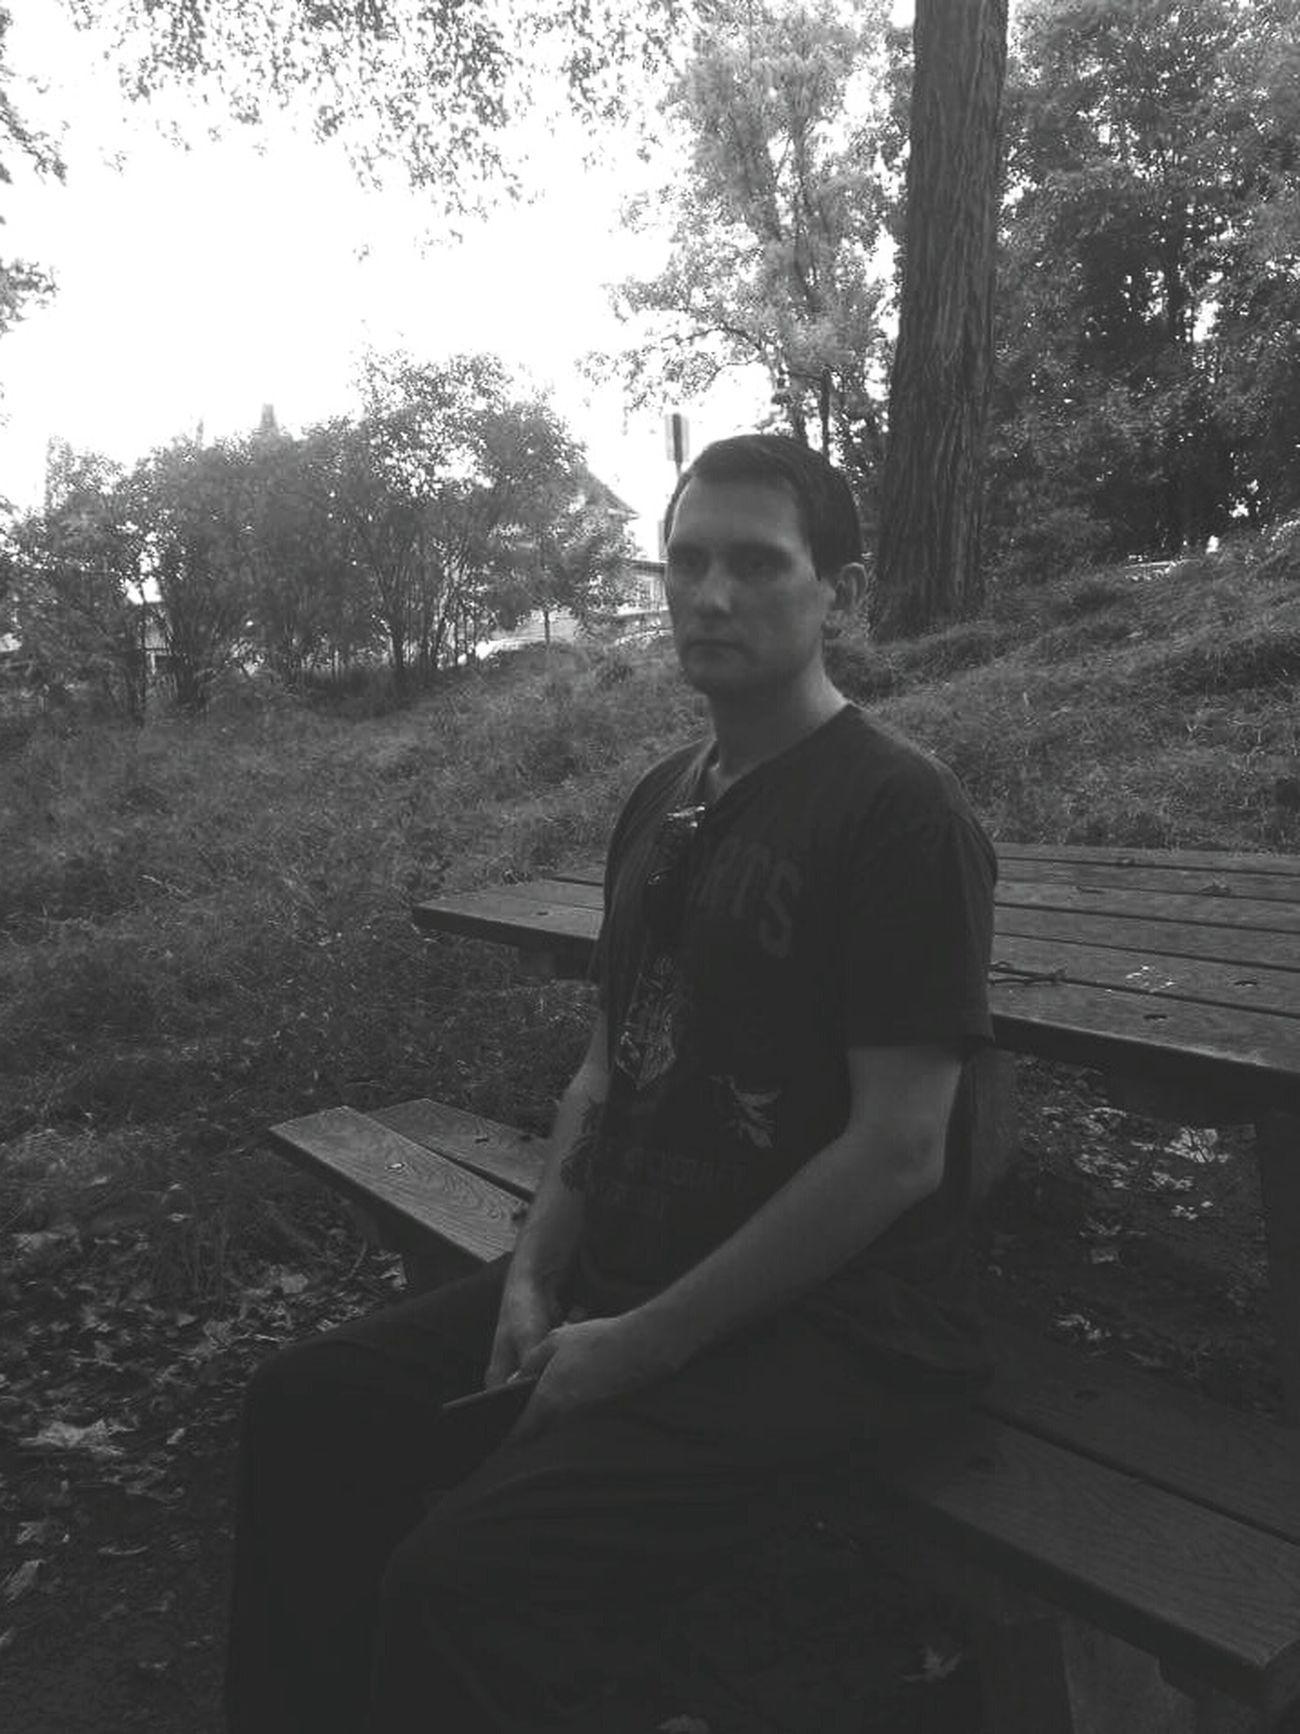 Contemplating Oblivion Depression Ptsd Contemplating My Death Thats Me Waiting To Die EyeEm Gallery EyeEm Mental Health